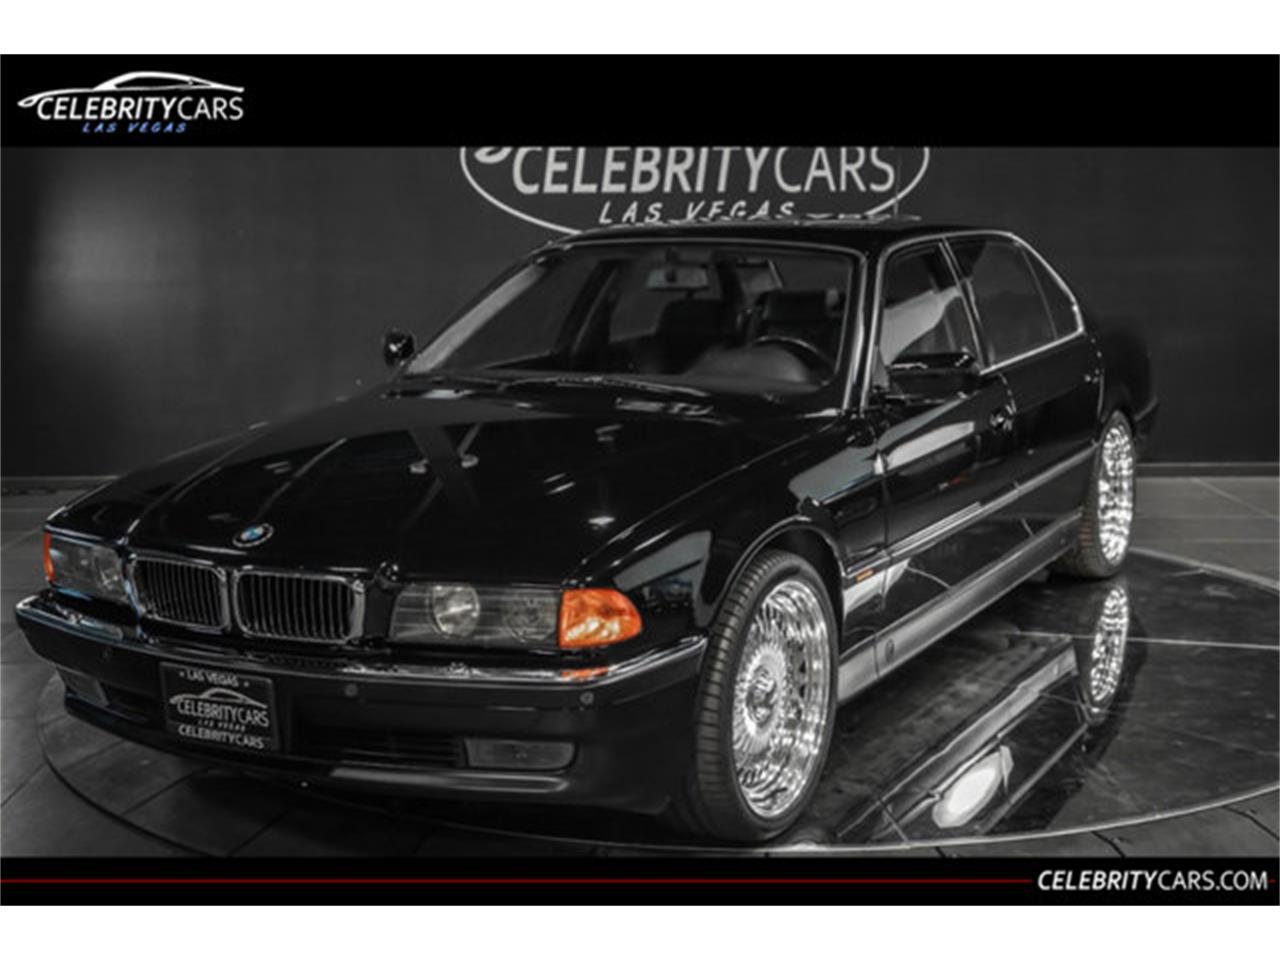 for sale 1996 bmw 7 series in las vegas, nevada cars - las vegas, nv at geebo